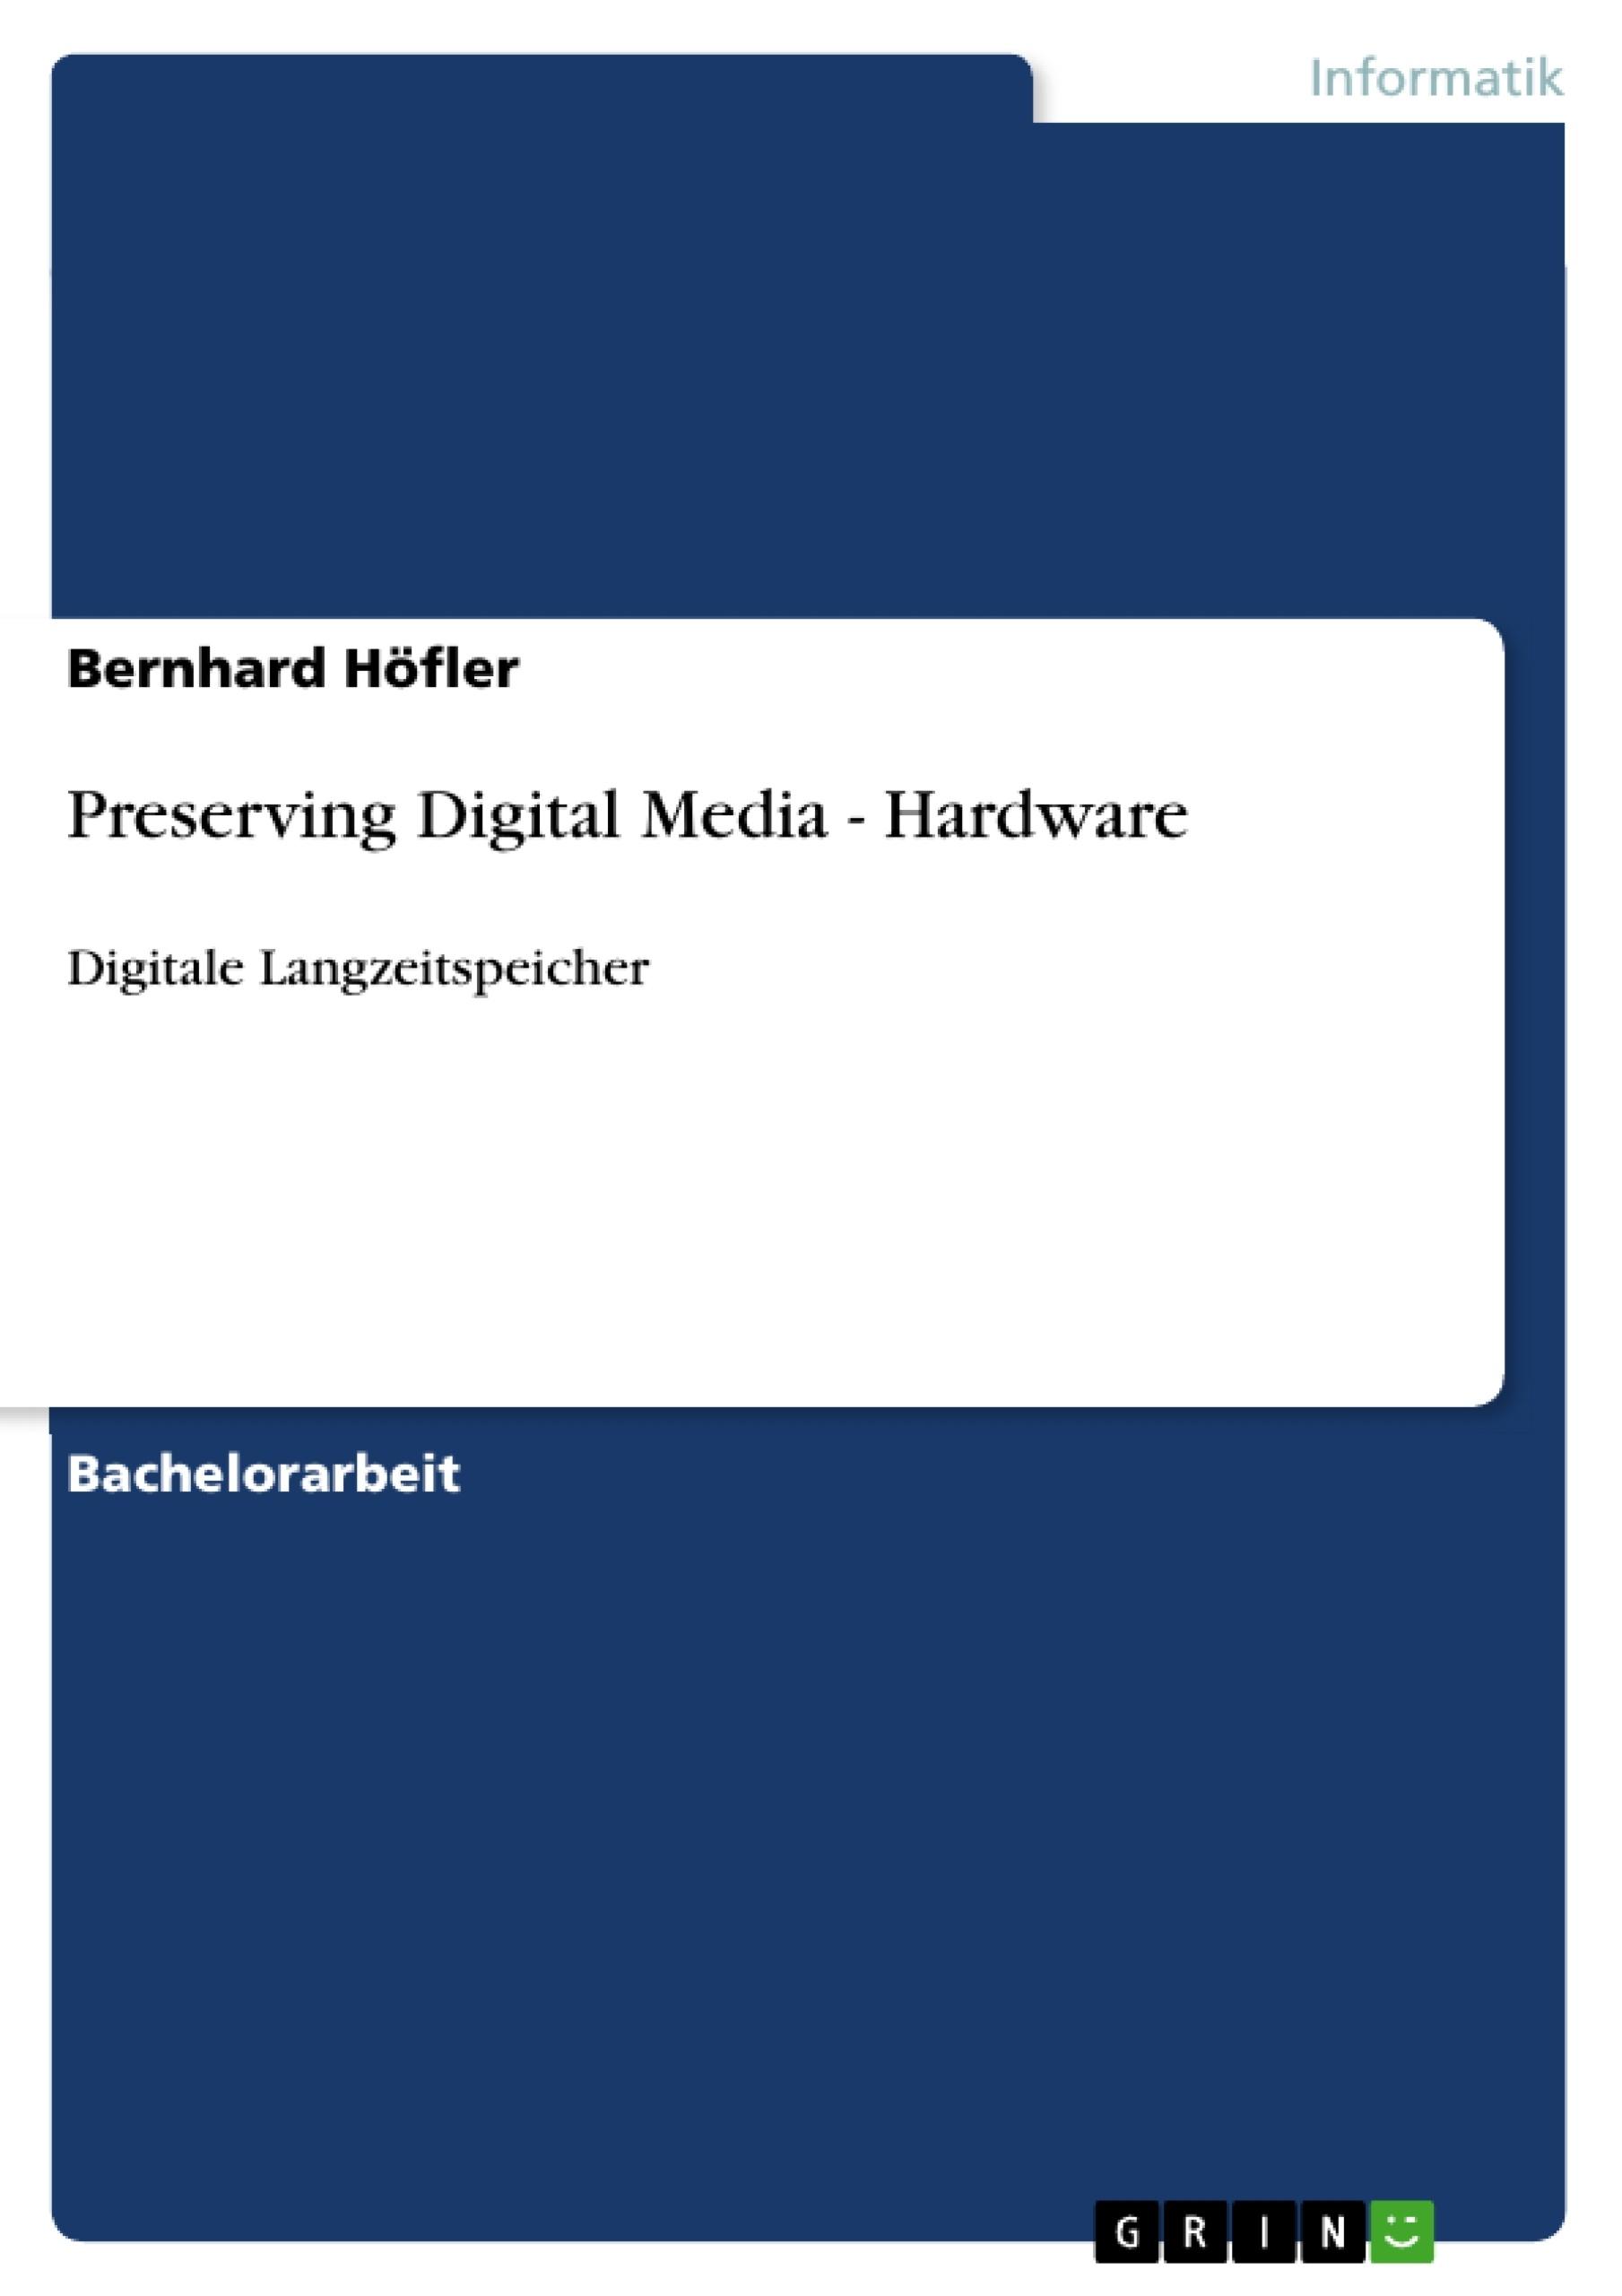 Titel: Preserving Digital Media - Hardware